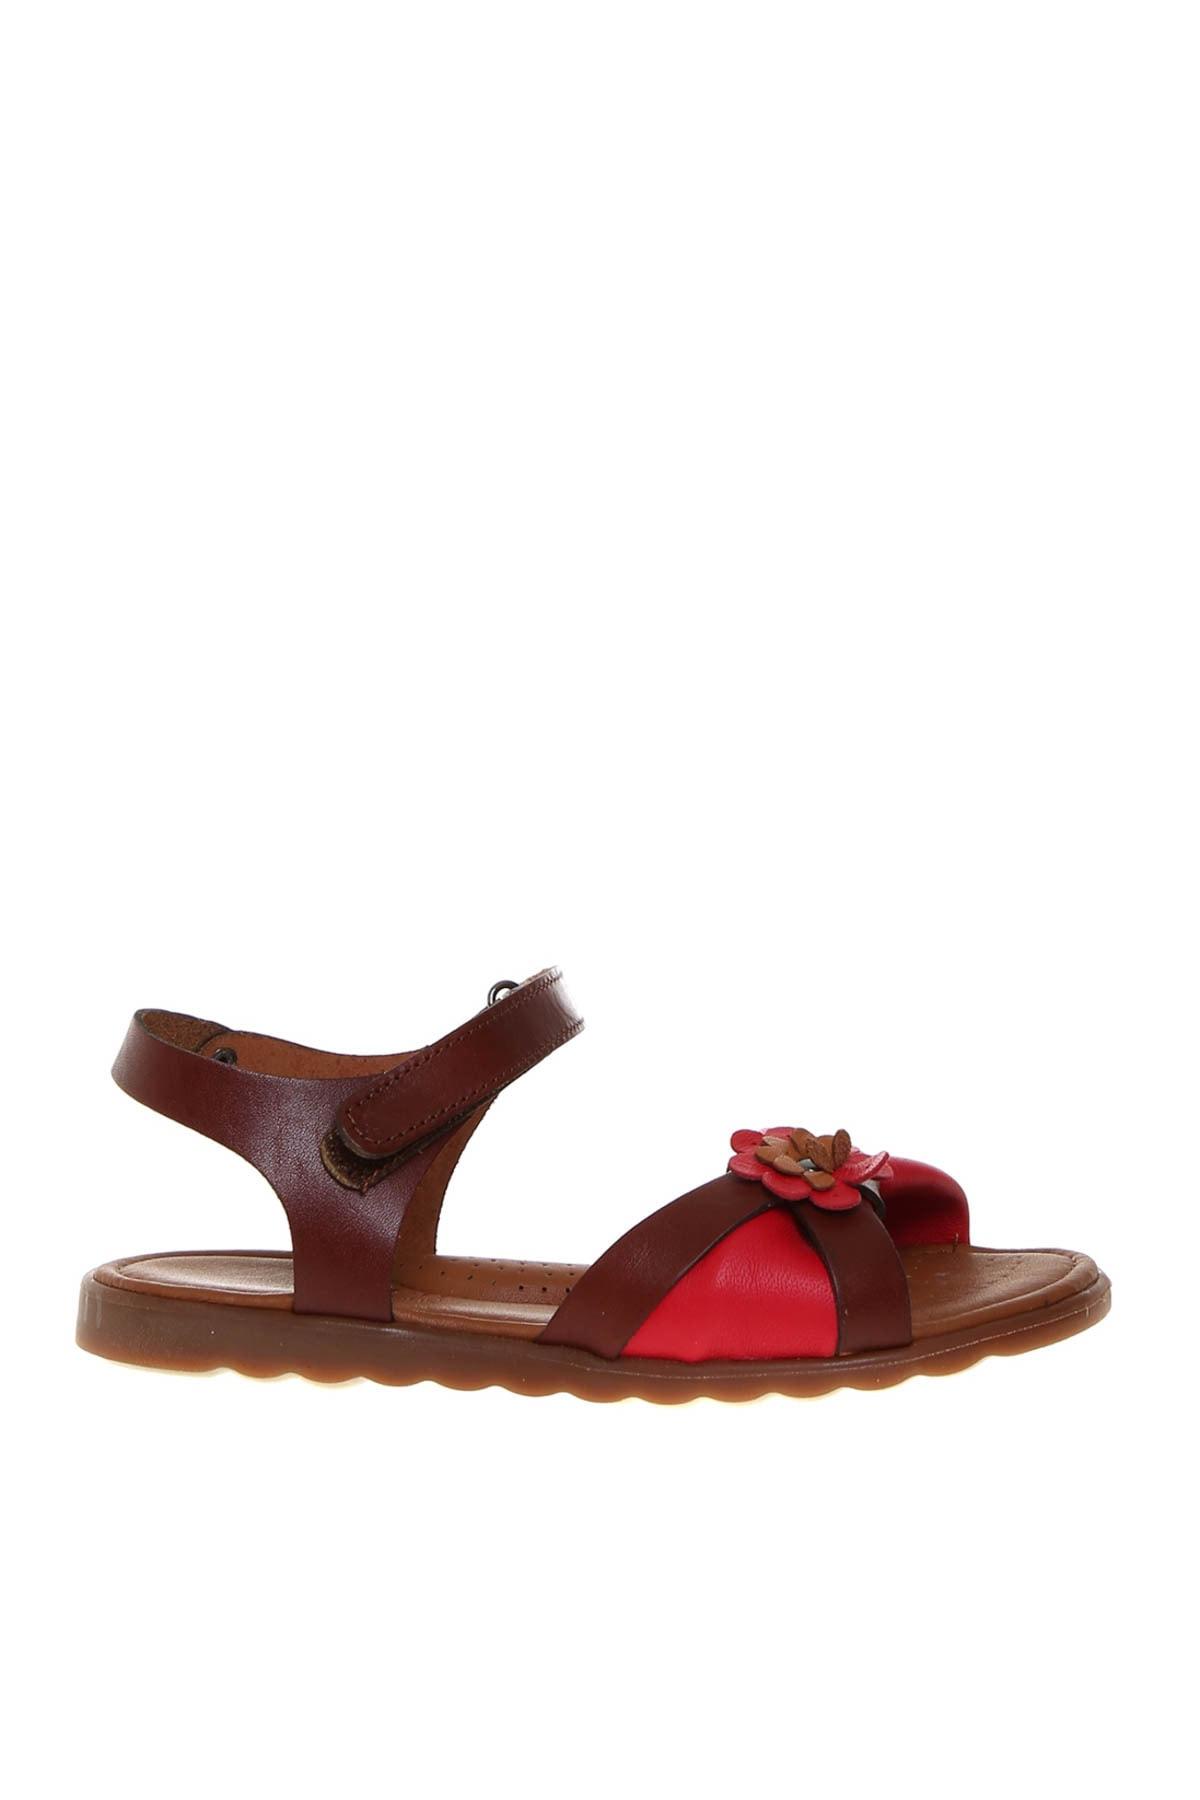 LİMON COMPANY Sandalet 1